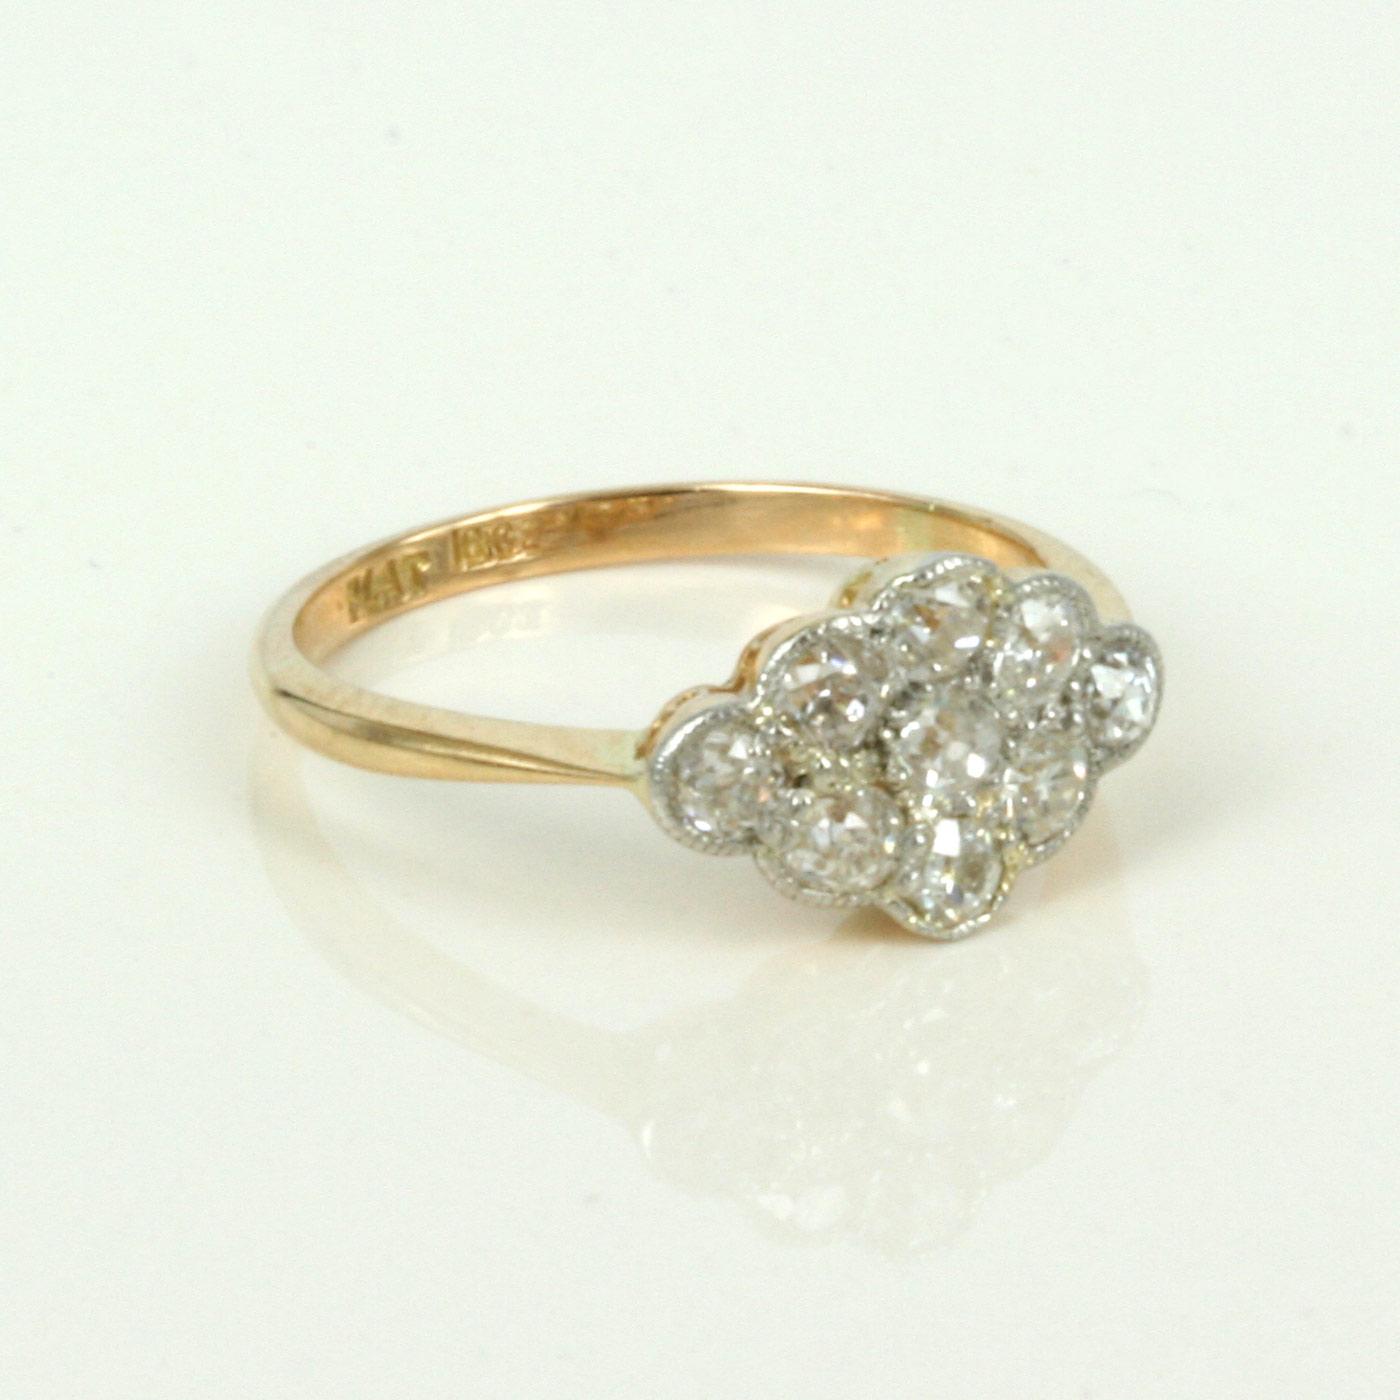 Antique Diamond Fancy Daisy Ring